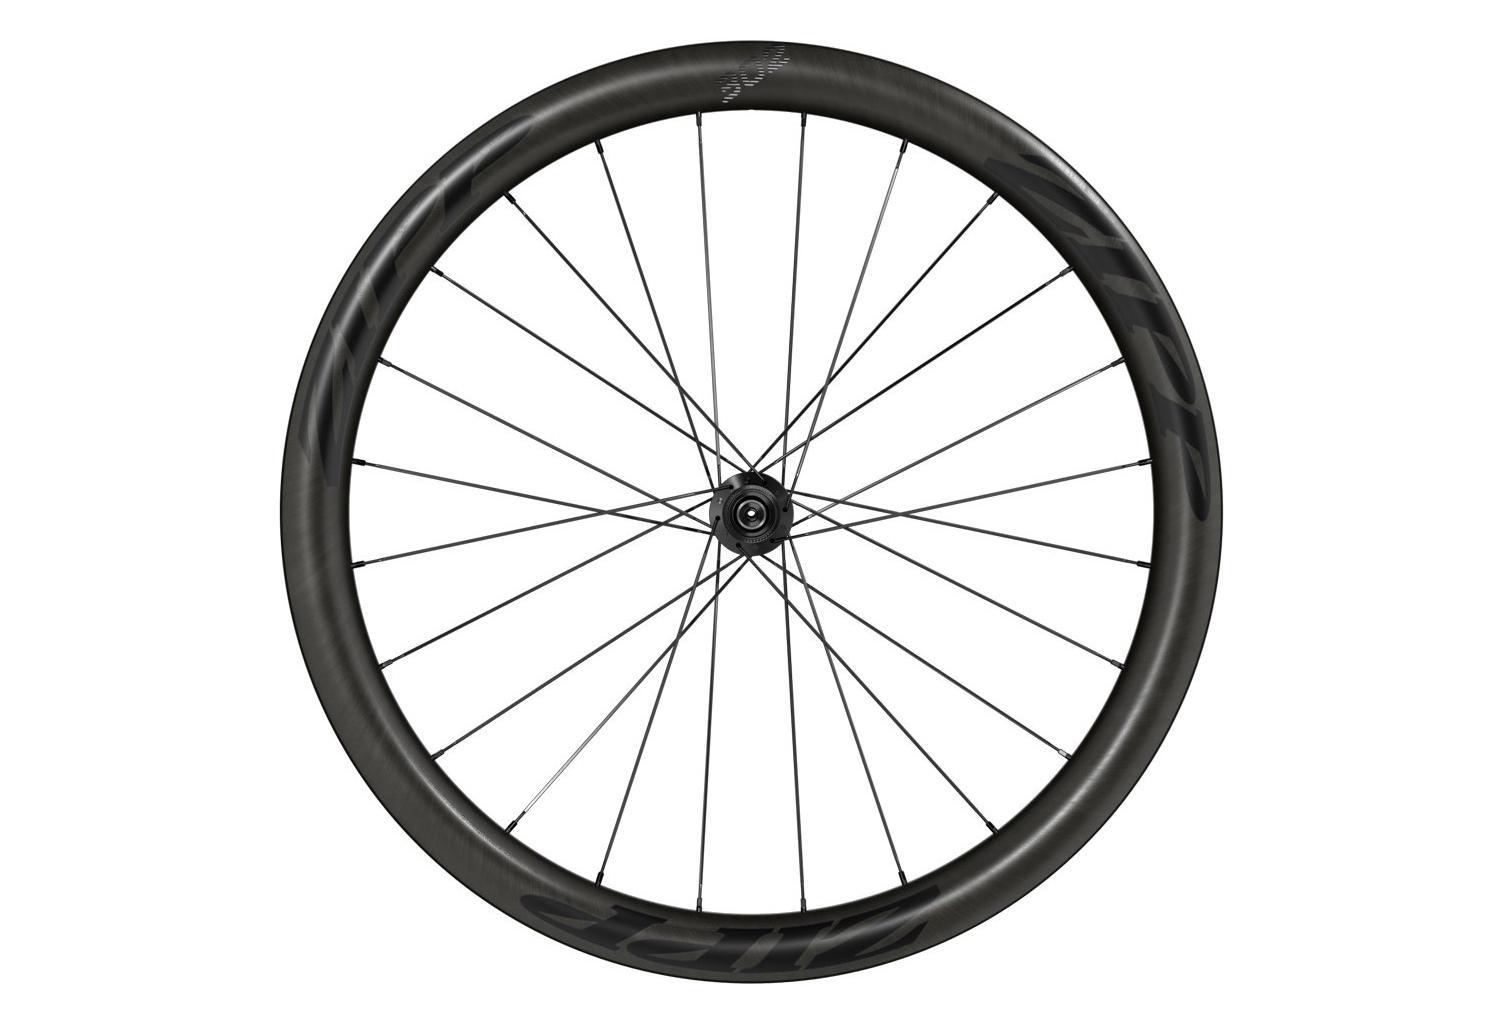 Zipp front wheel 302 tubetype v1 black stickers